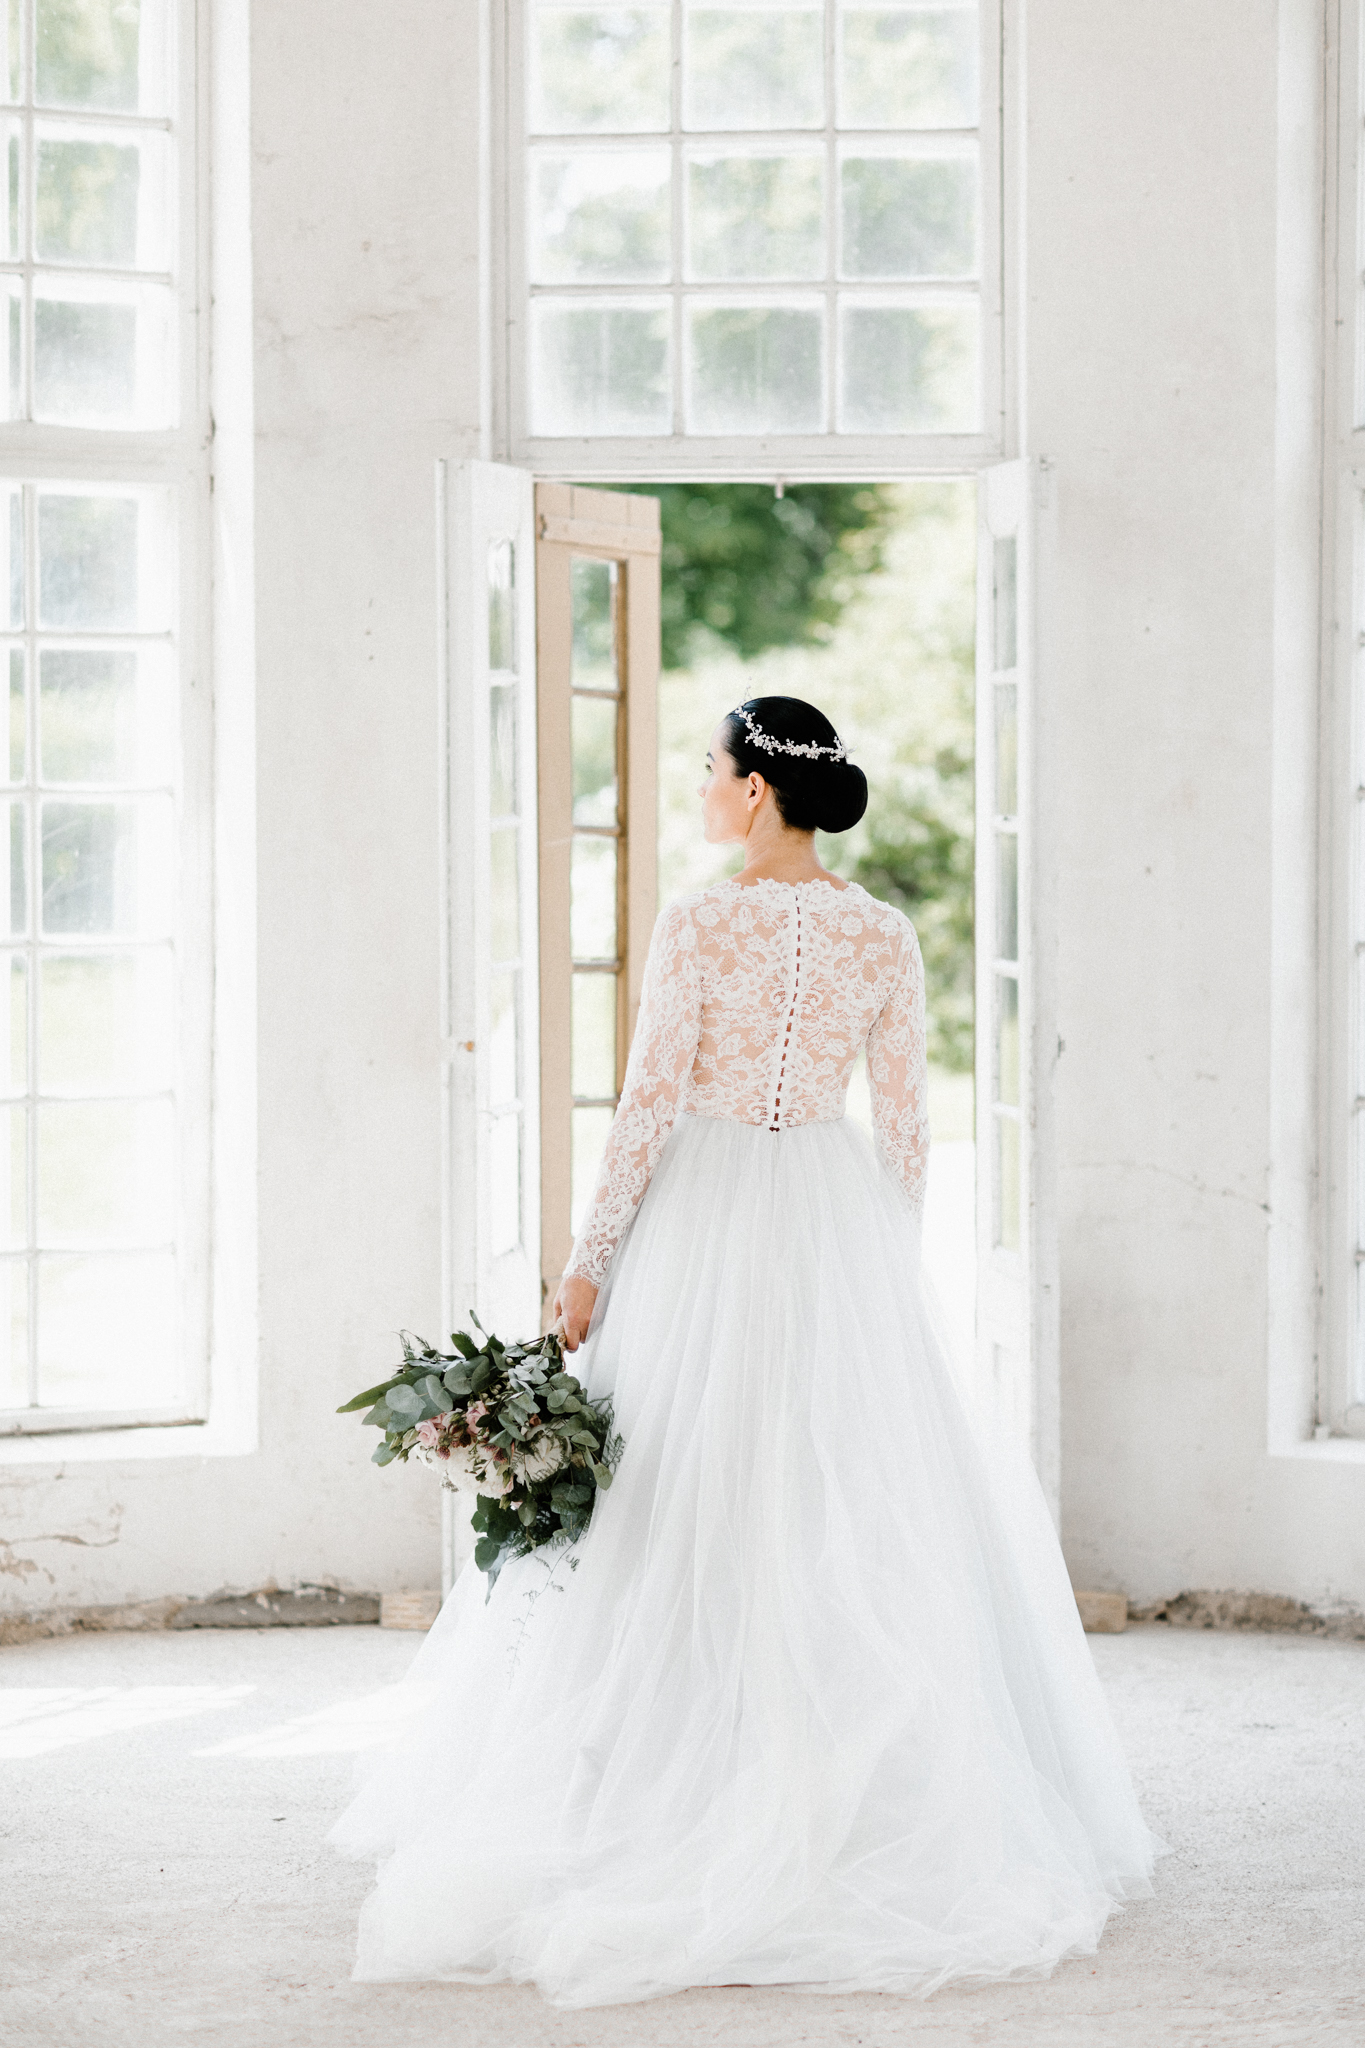 Essi + Ville   Oitbacka Gården   by Patrick Karkkolainen Wedding Photography-80.jpg